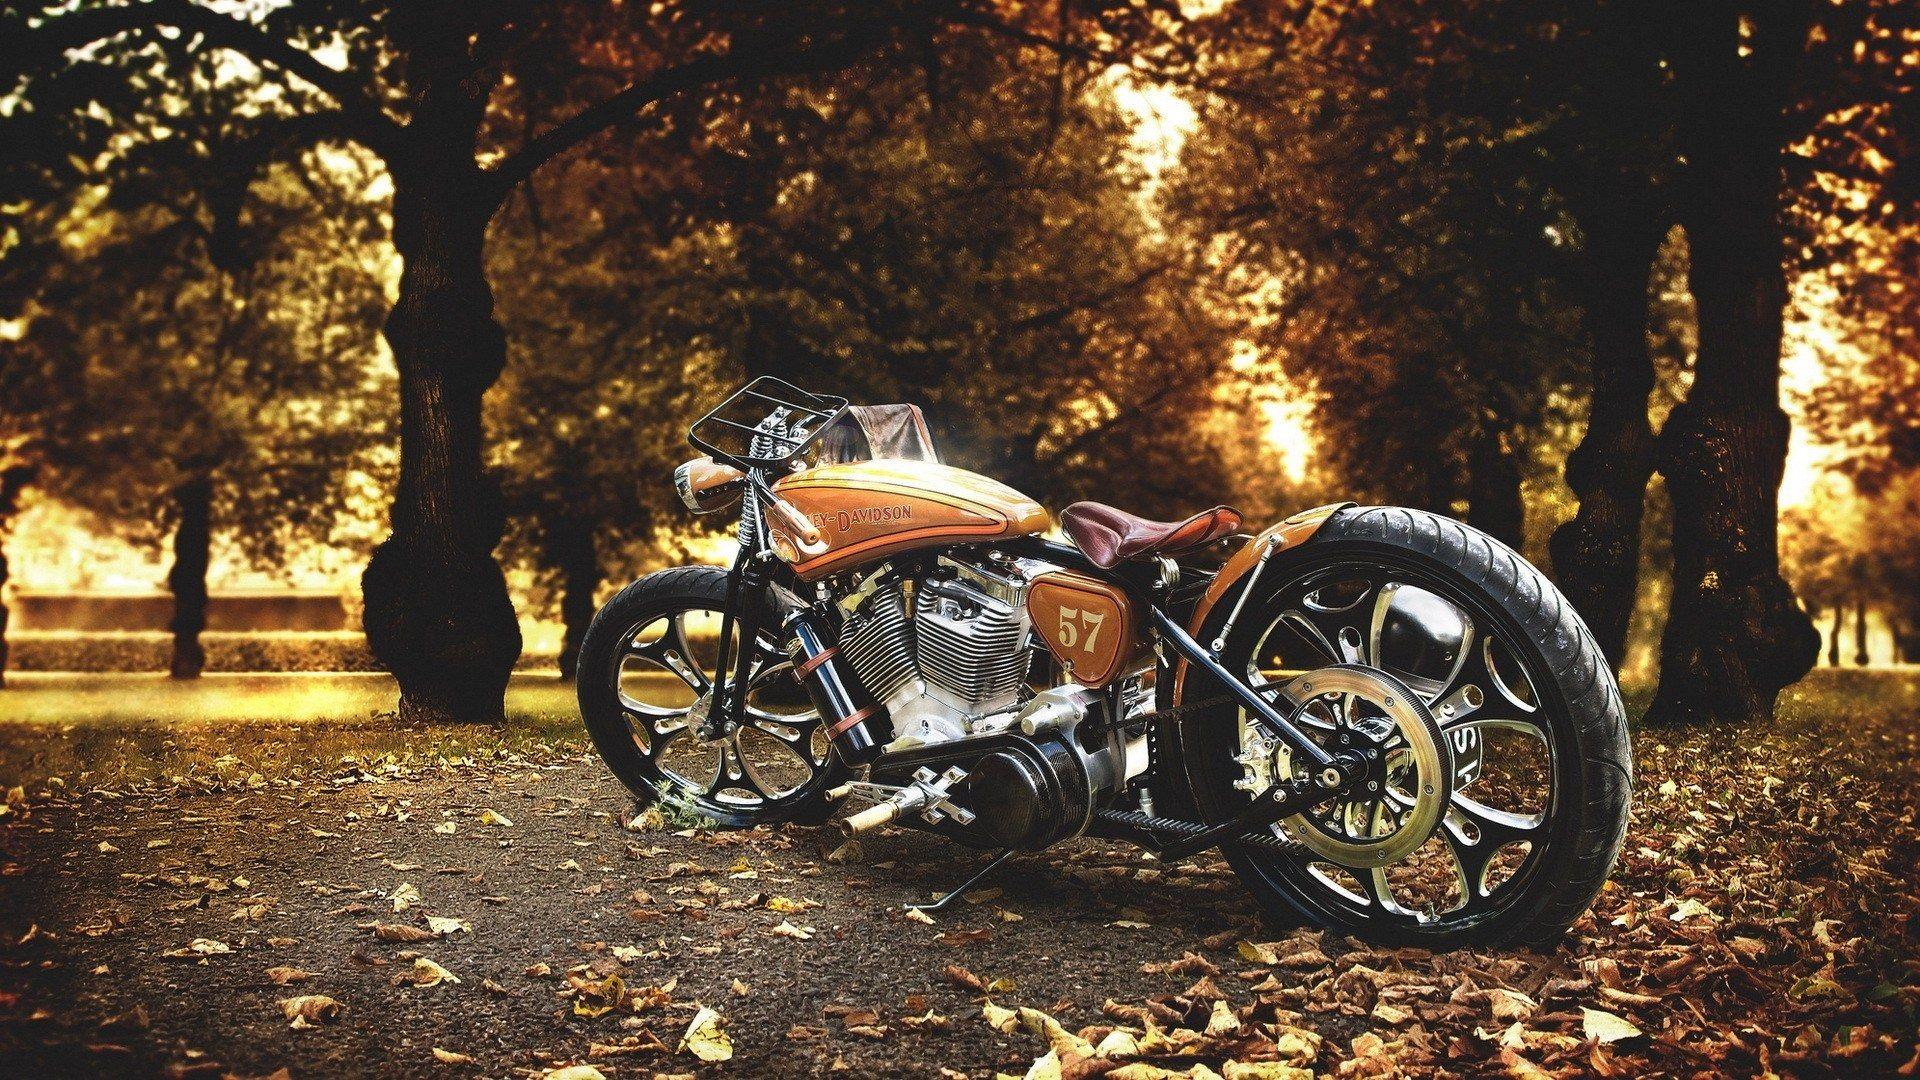 1920x1080 Harley Davidson Best Hd Wallpaper Desktop Harley Davidson Wallpaper Motorcycle Wallpaper Harley Davidson Photos